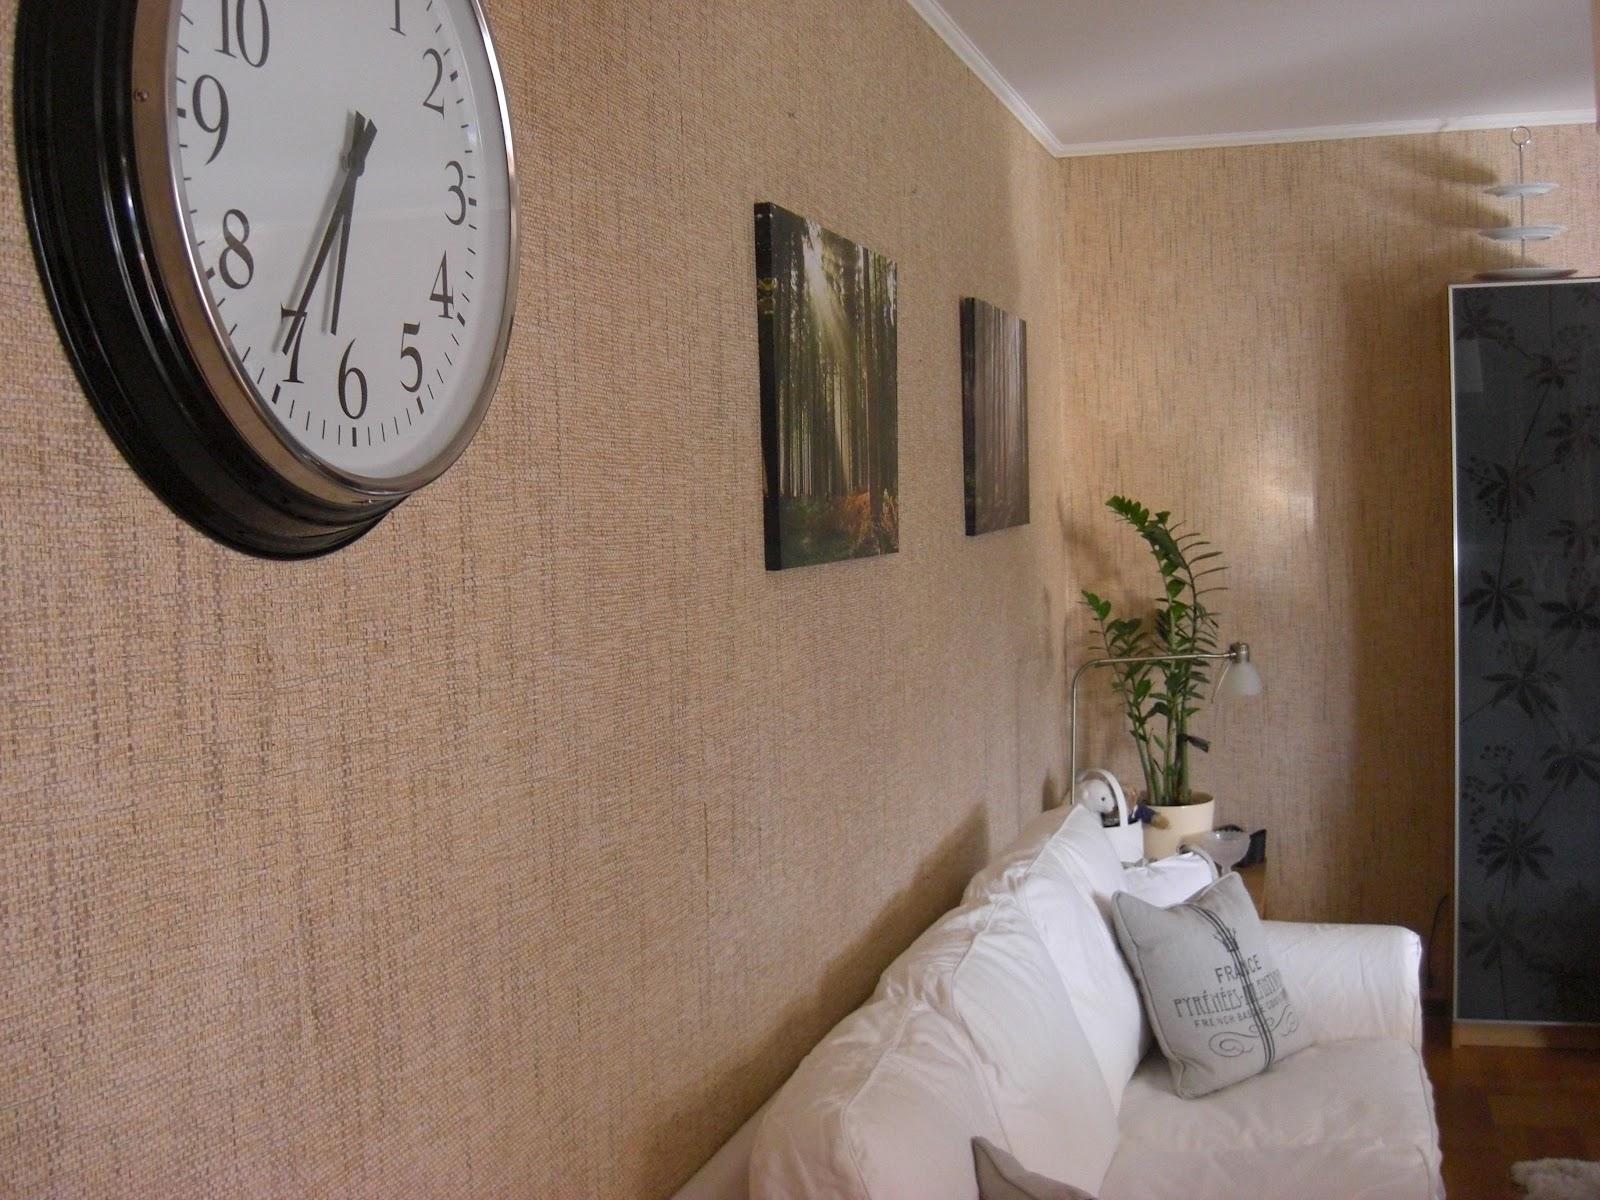 House of the green lady: nya tavlor i vardagsrummet